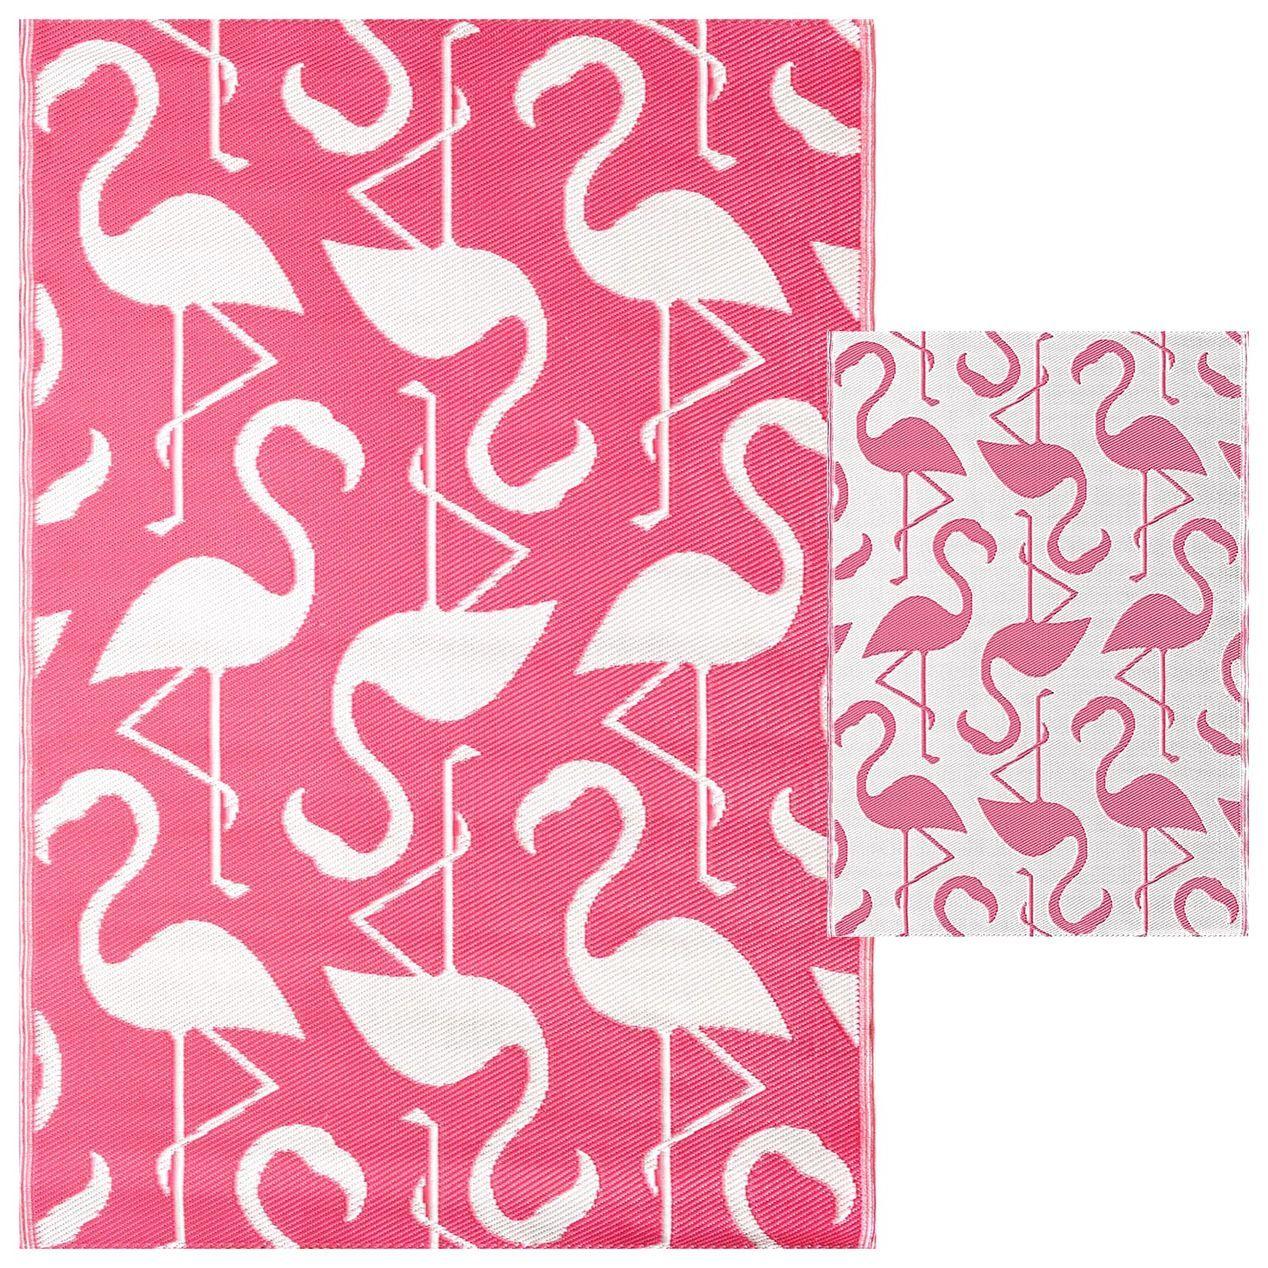 Pink Flamingo Outdoor Woven Area Rug 5x7 Patio Rugs